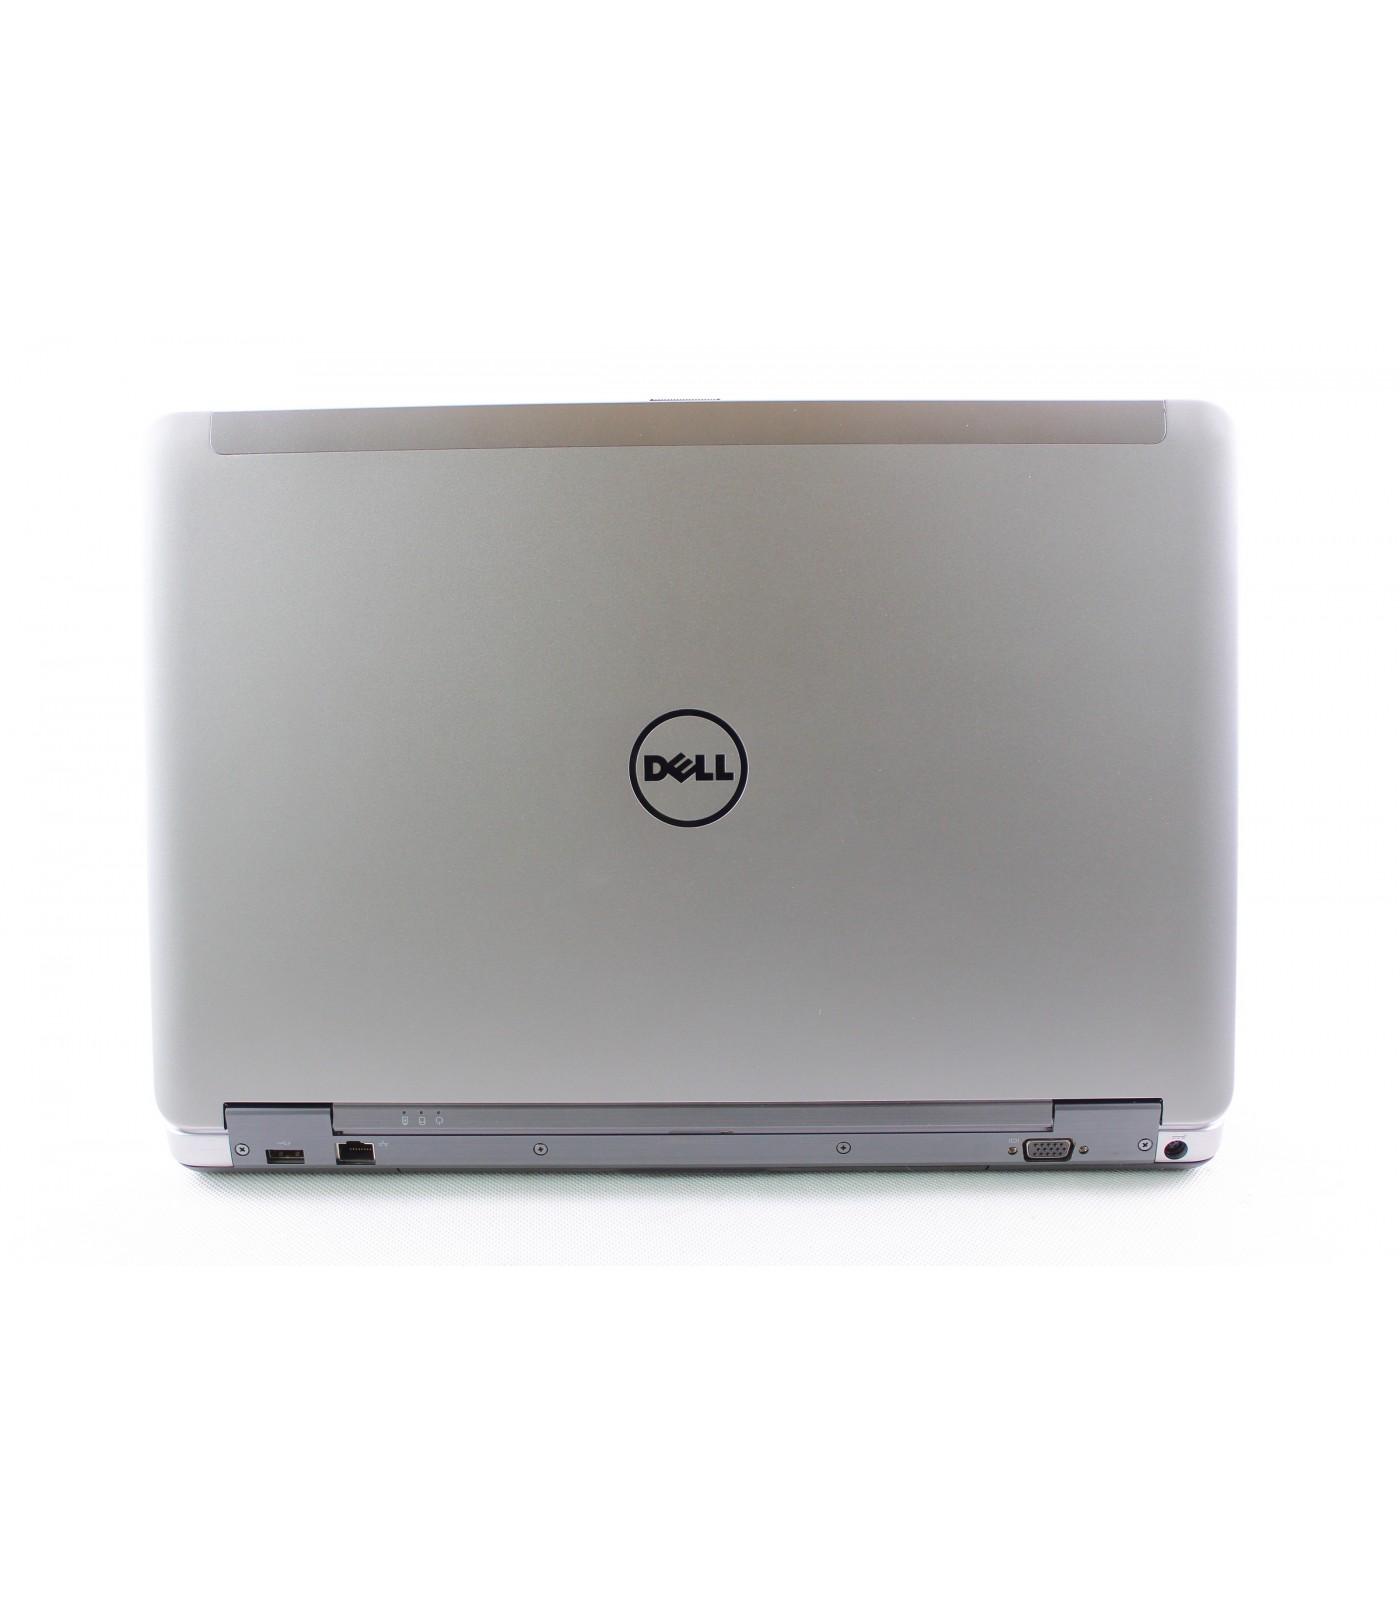 Dell Latitude E6540 i7 4 generacji 1920x1080 IPS AMD Radeon HD 8790M Klasa A